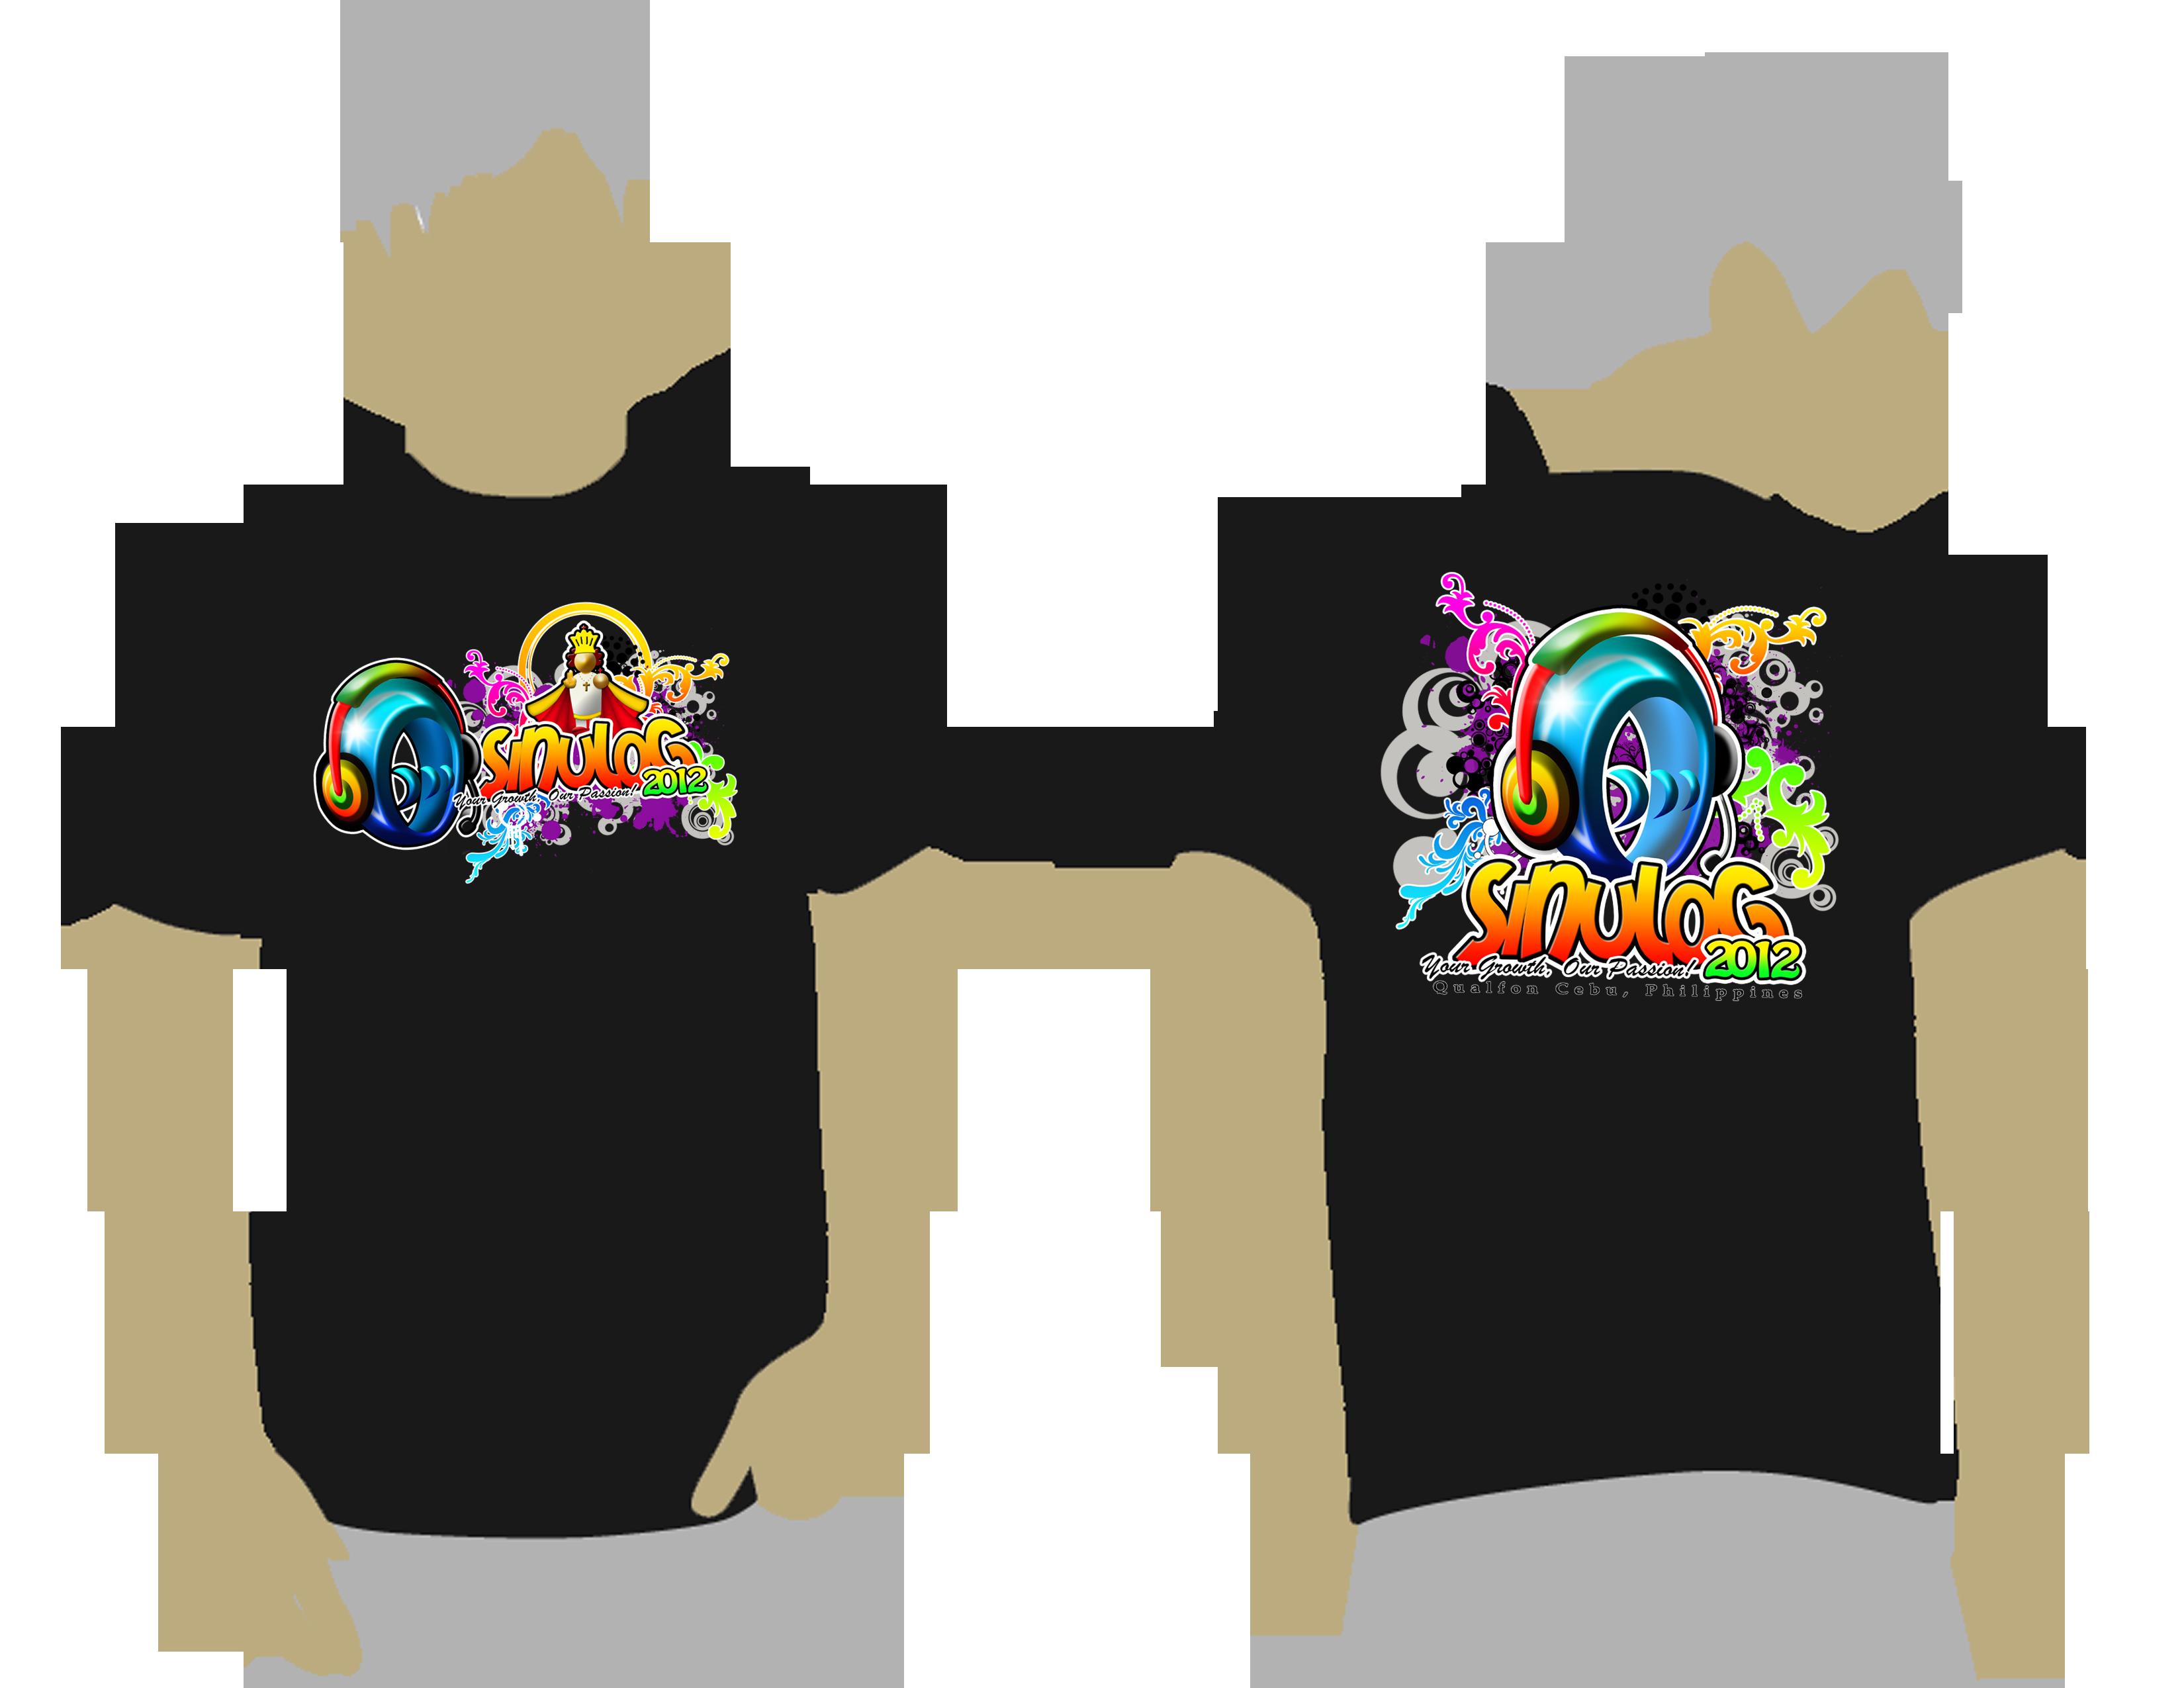 Shirt design images 2017 - Sinulog Shirt Design By Twitzyroll Sinulog Shirt Design By Twitzyroll